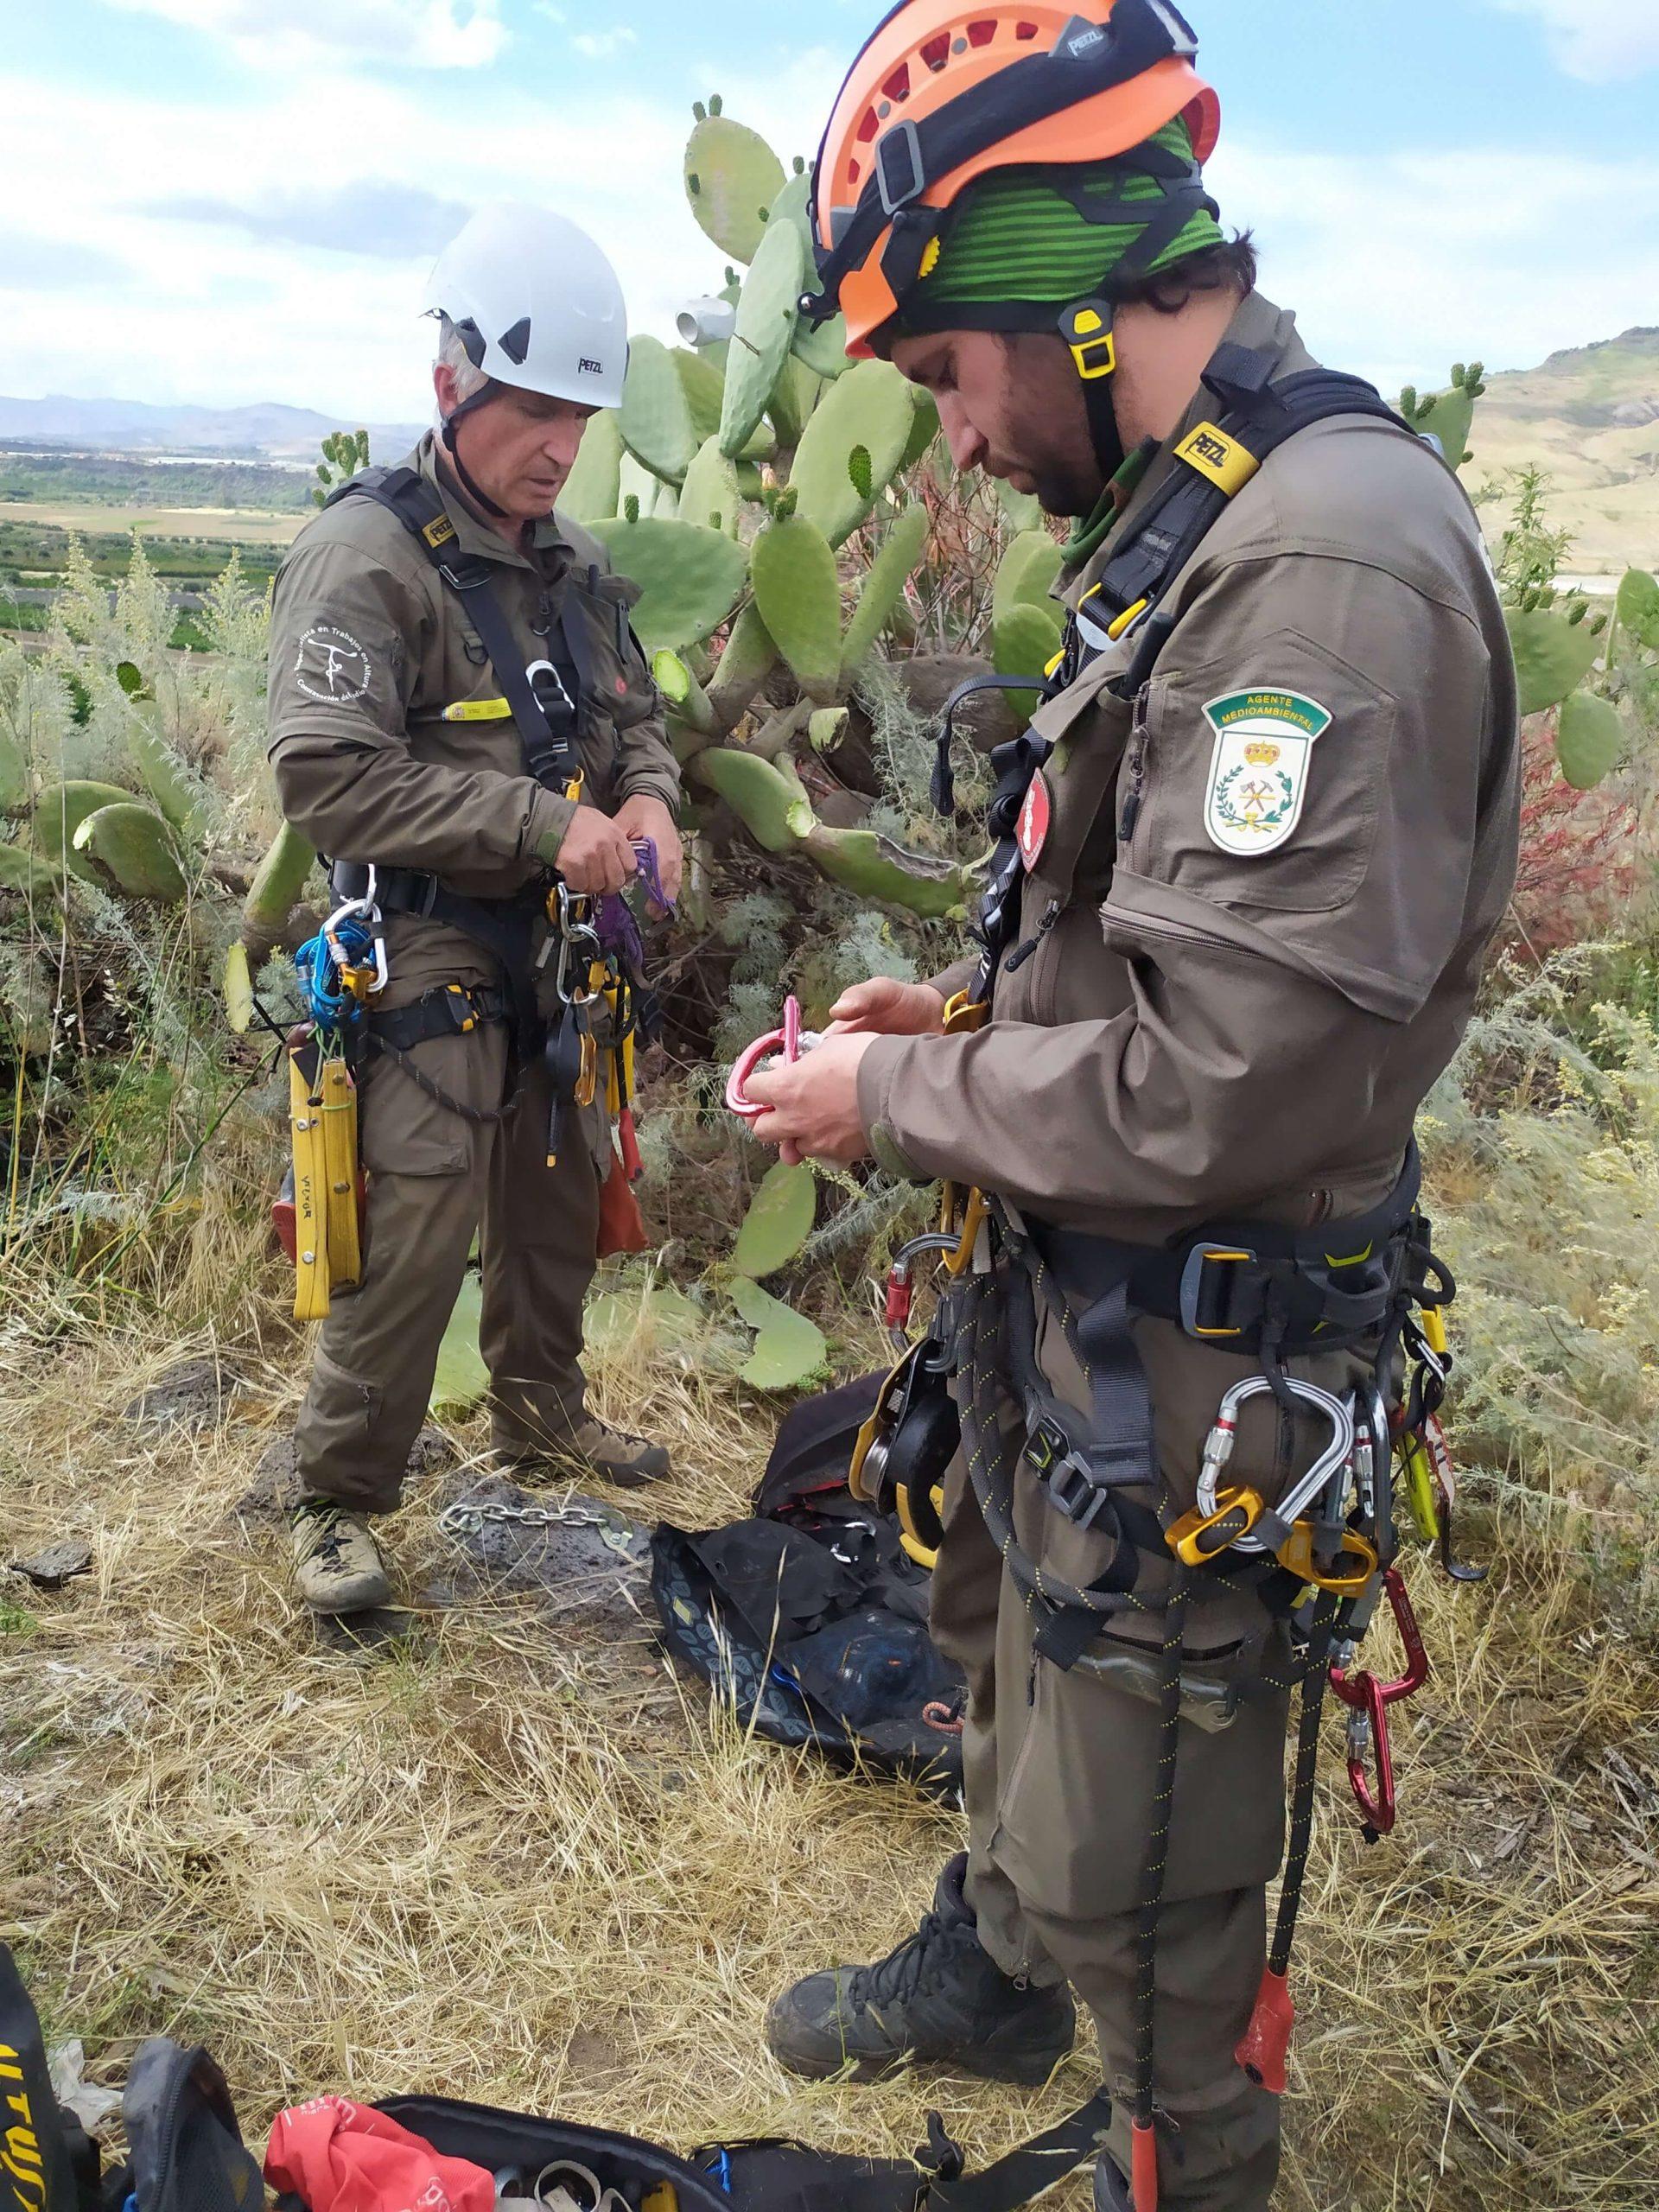 GREFA staff members during preparatory operations - Pollutri